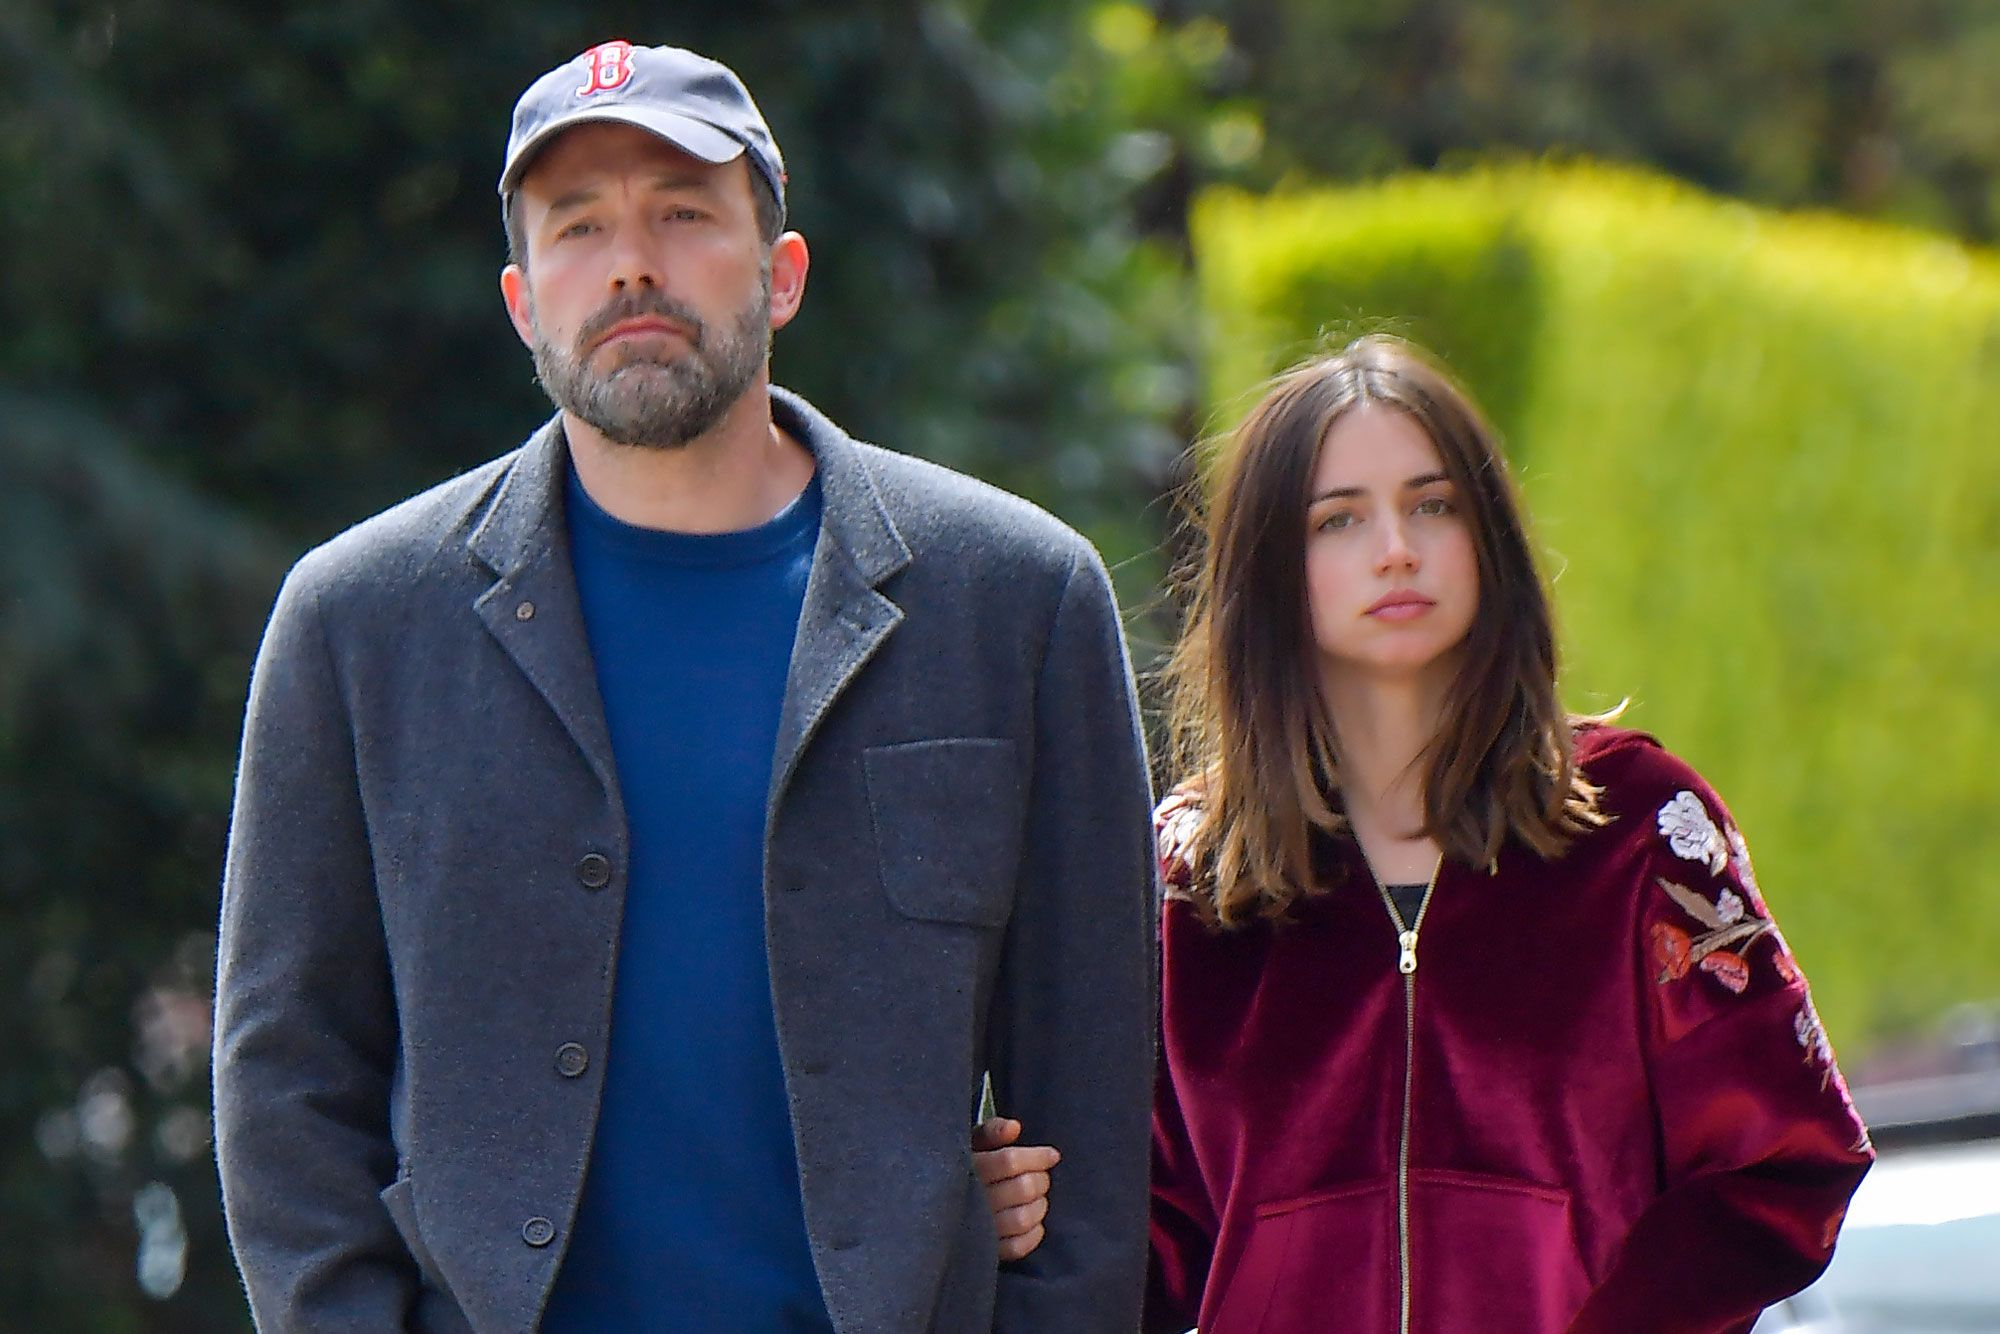 ben-affleck-and-ana-de-armas-reportedly-ended-relationship-after-disagreements-over-having-kids